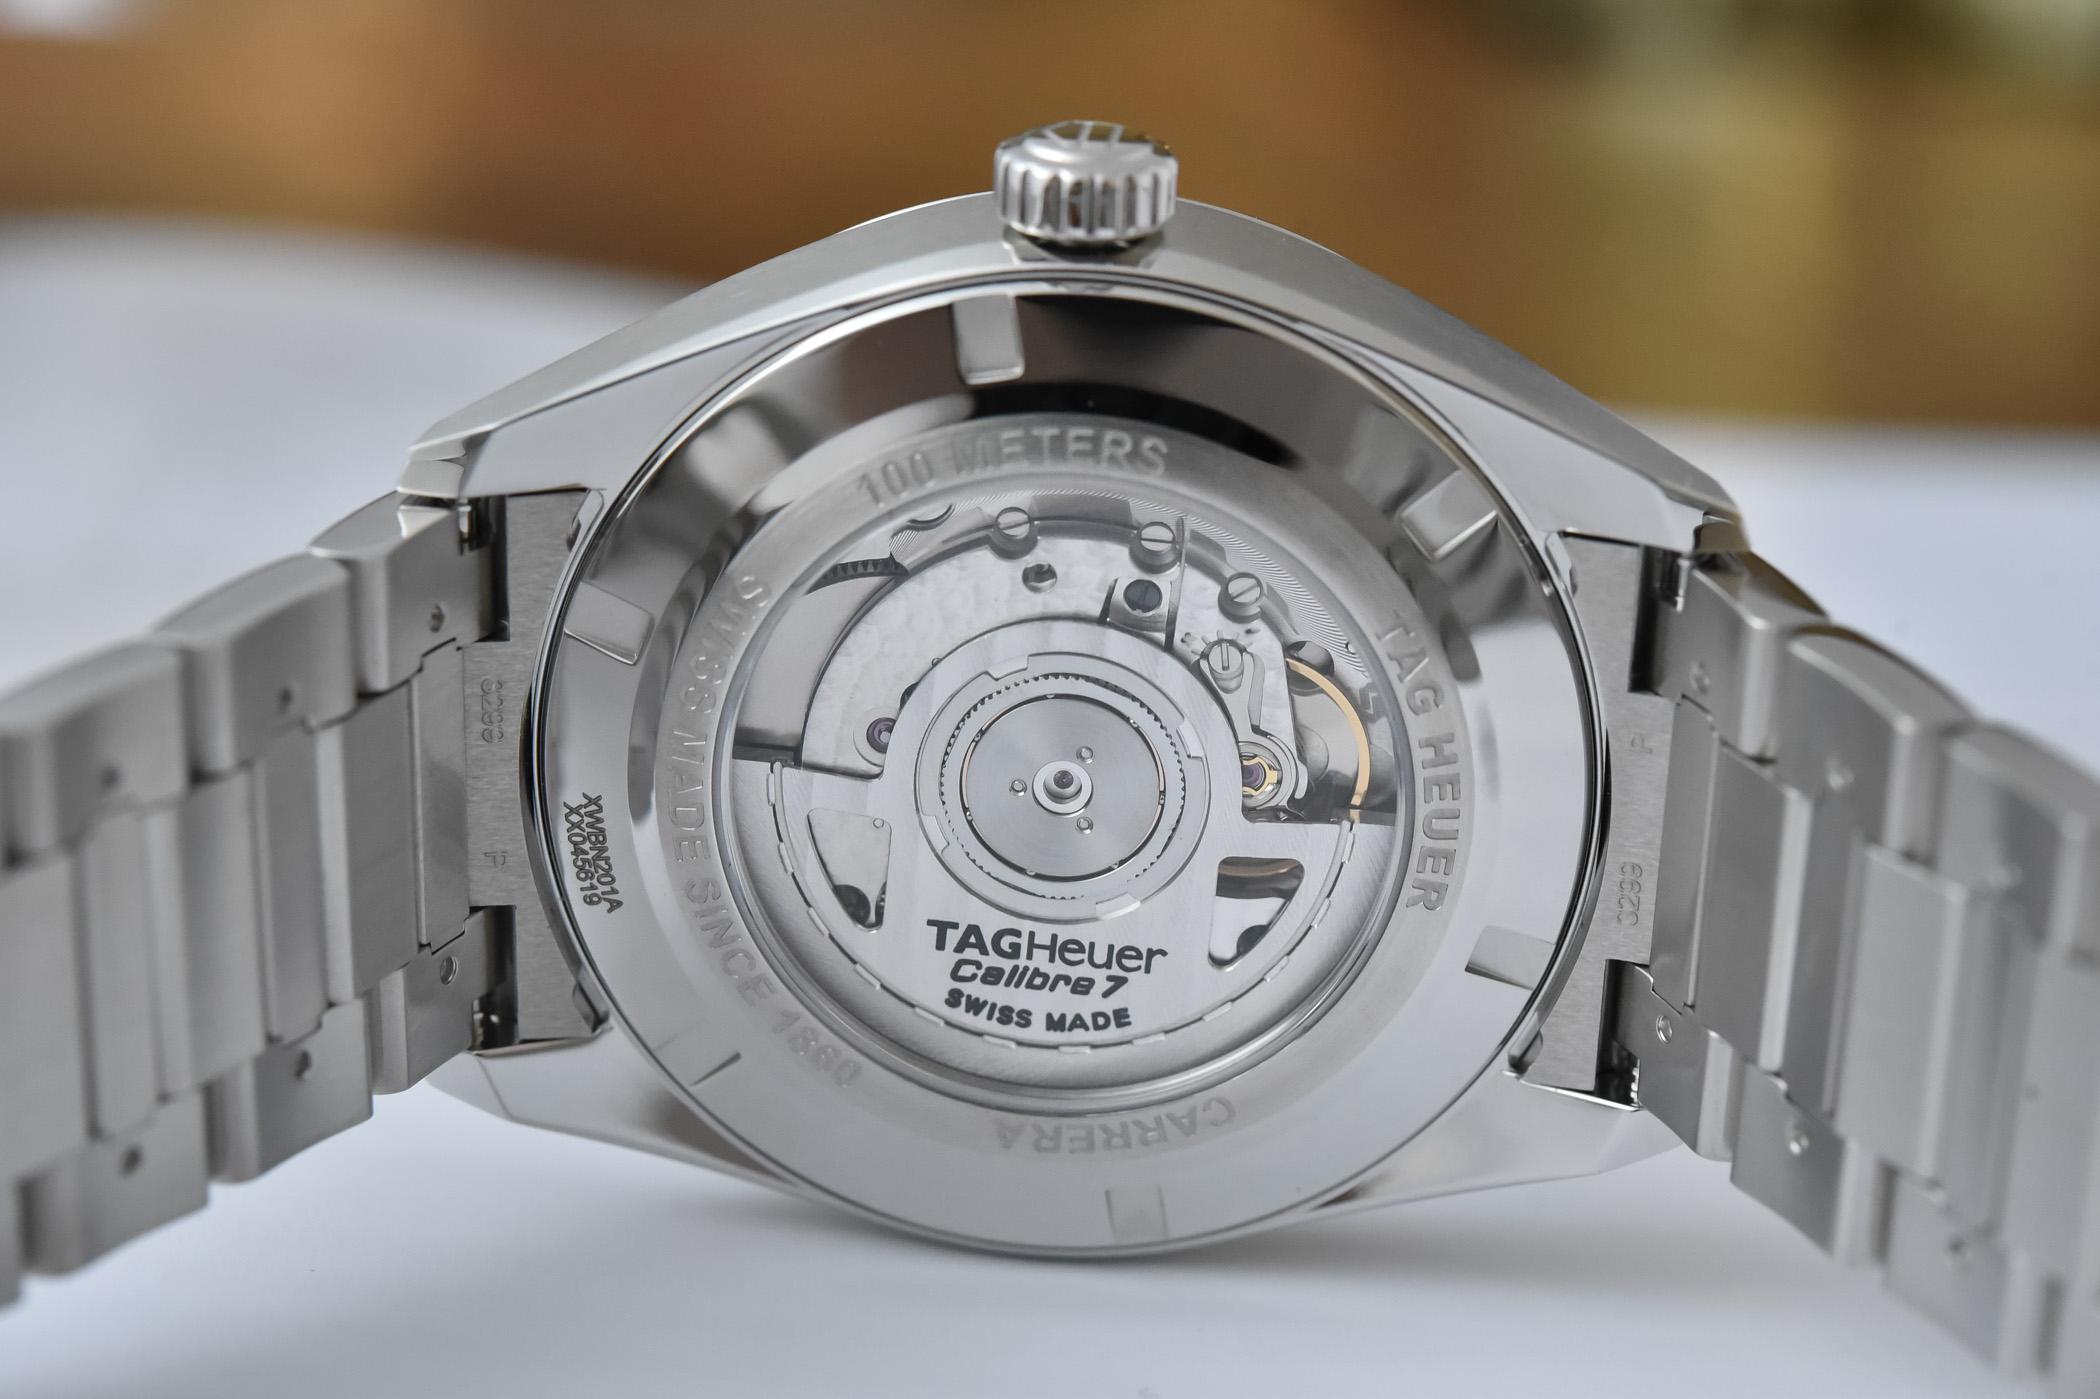 2021 TAG Heuer Carrera Twin-Time Date 41mm WBN201A.BA0640 calibre 7